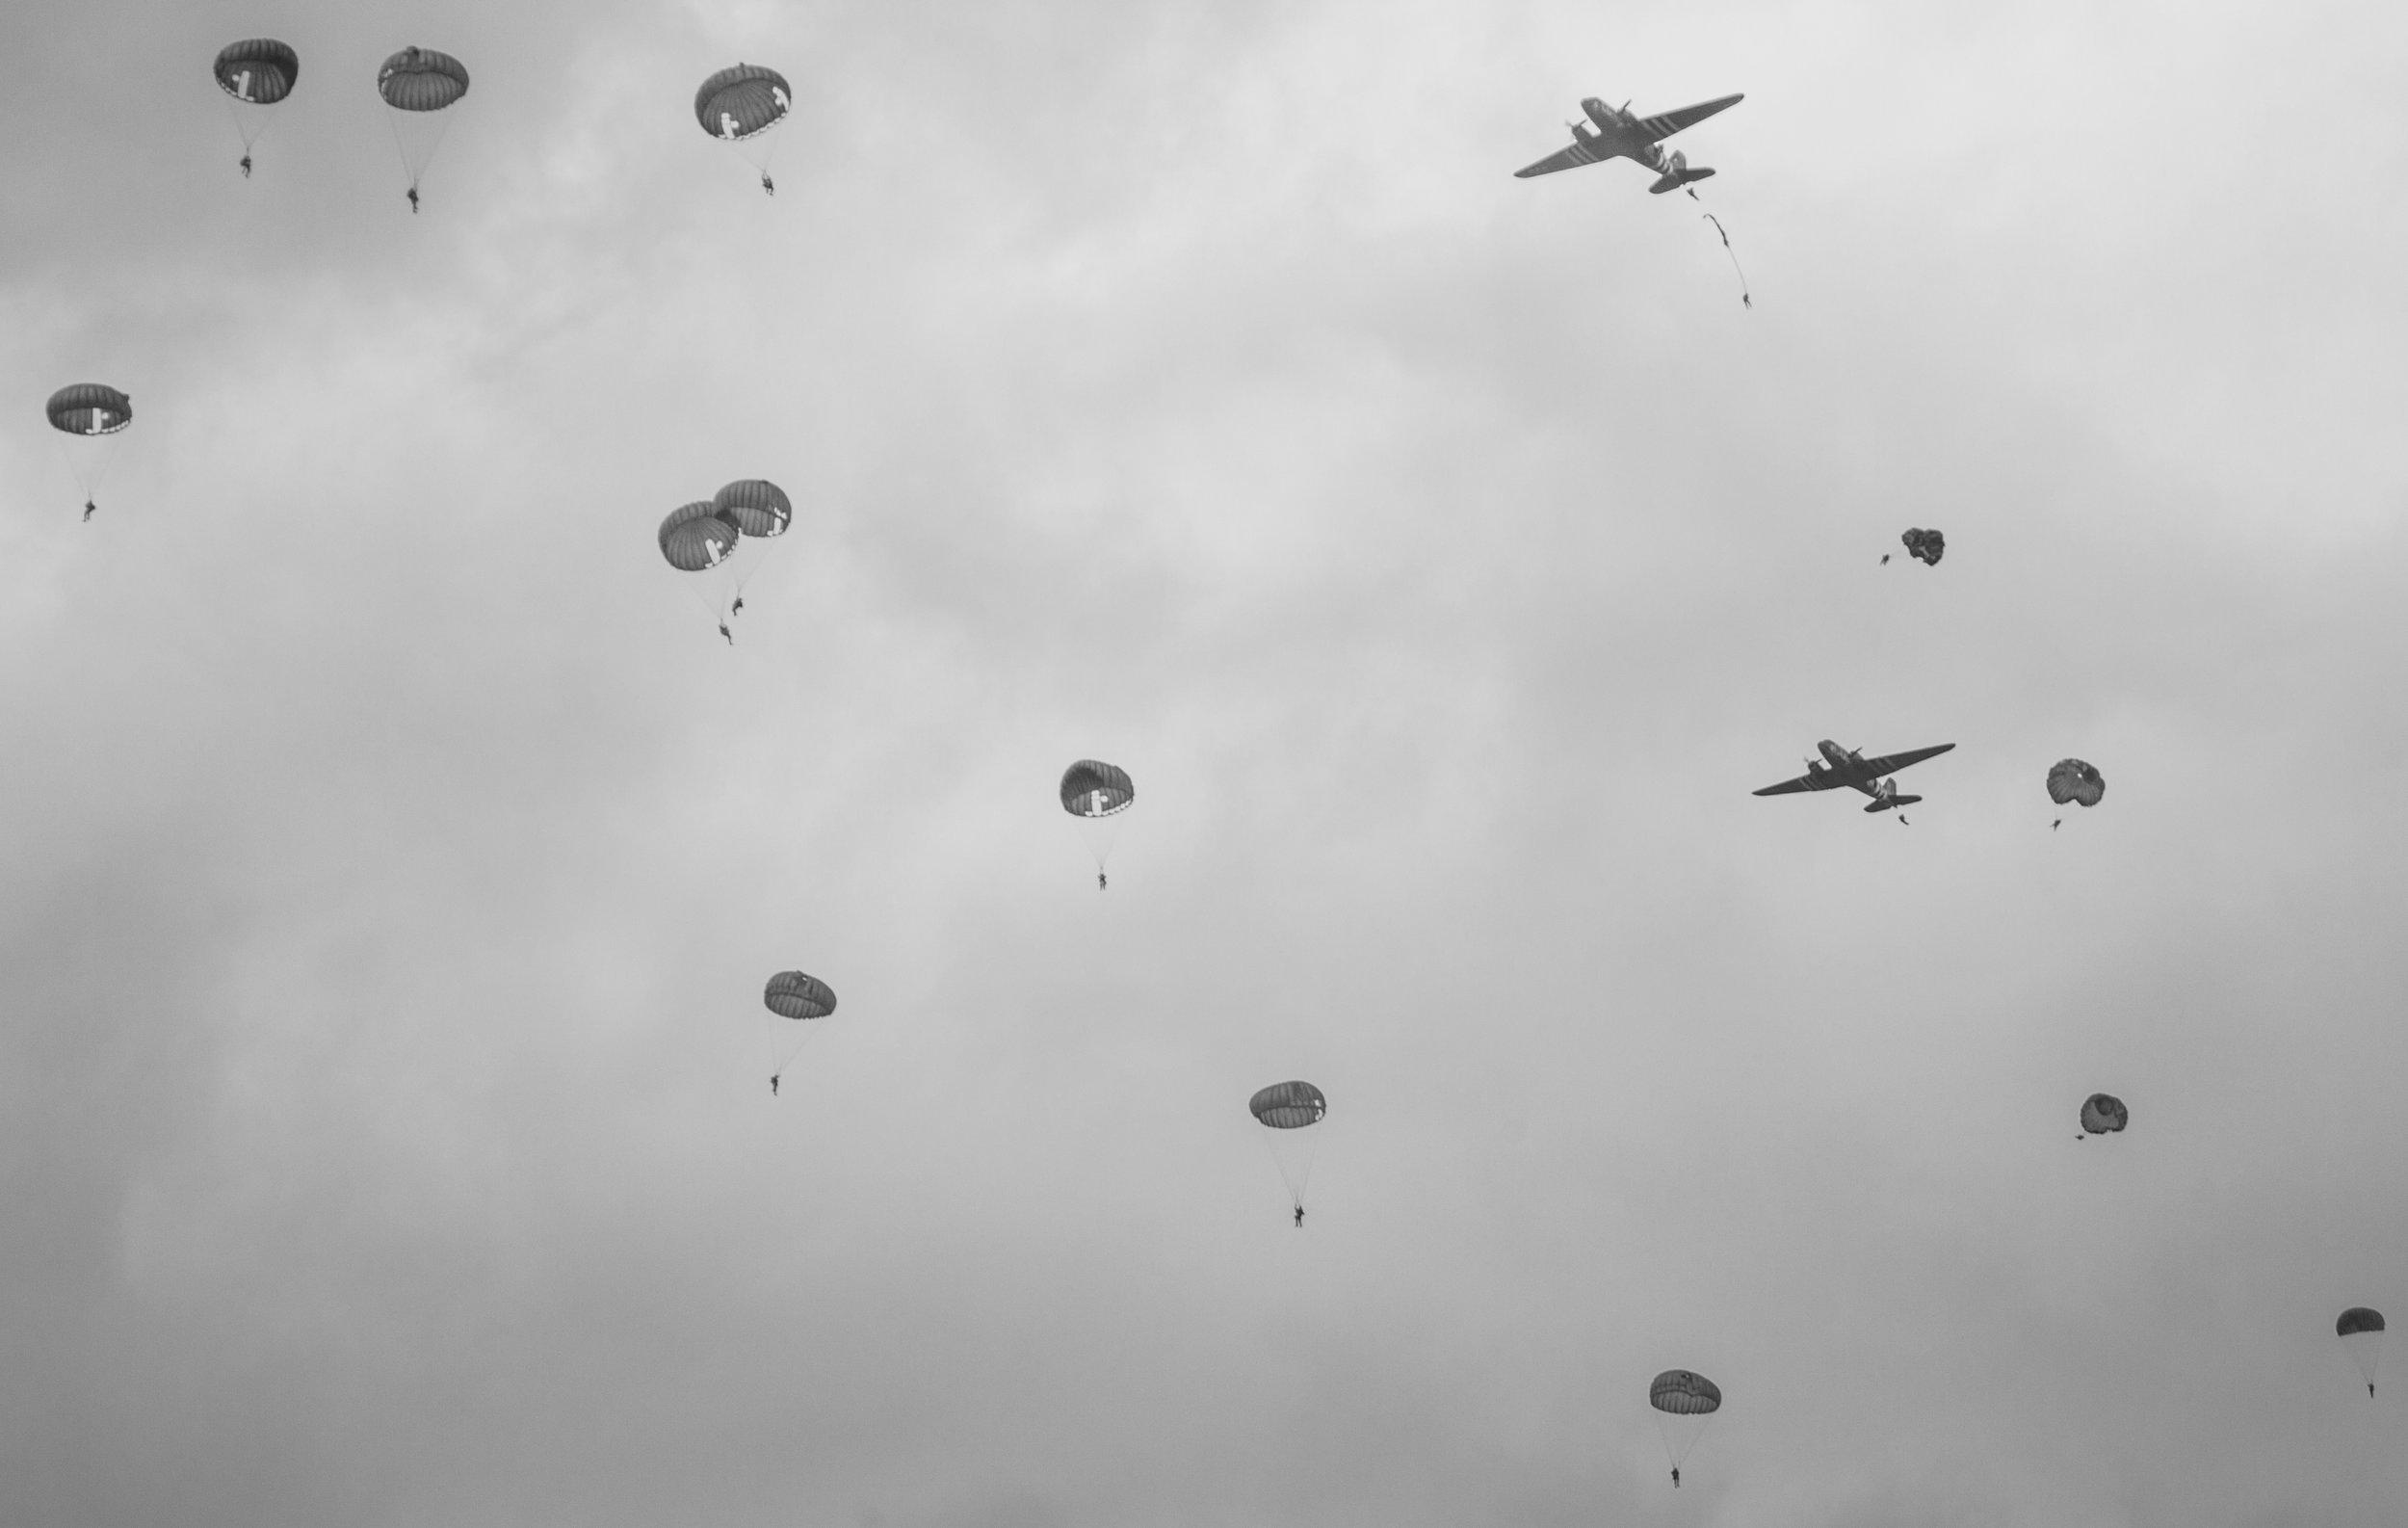 Daks over Normandy Para Drop Sannerville (Drop Zone K) 5th June 2019. Photo: Debbie Riley